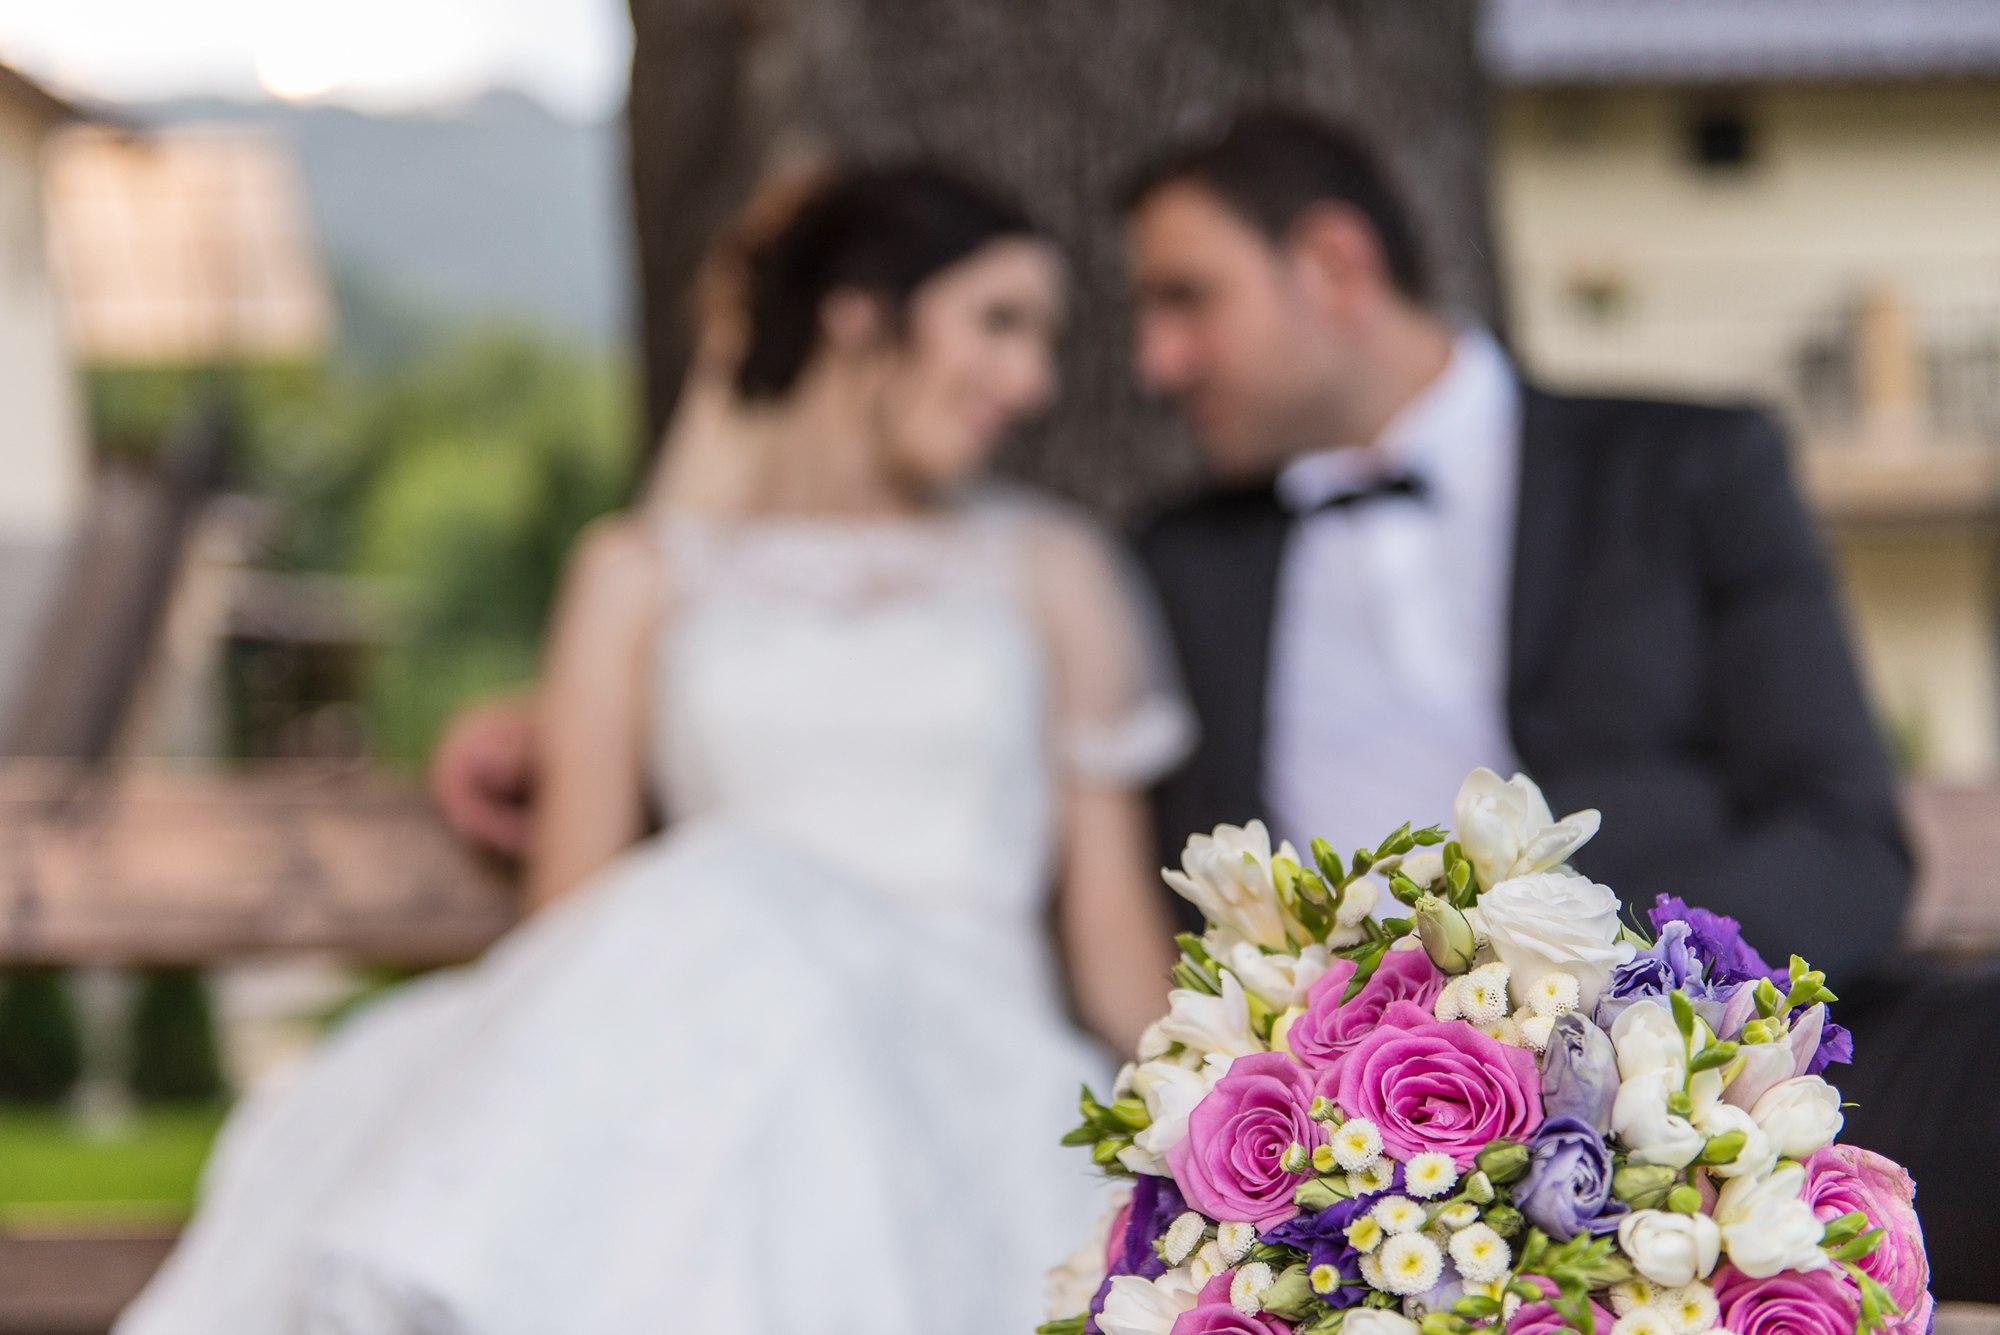 Georgiana & Andrei - Fotograf nunta Andi Iliescu